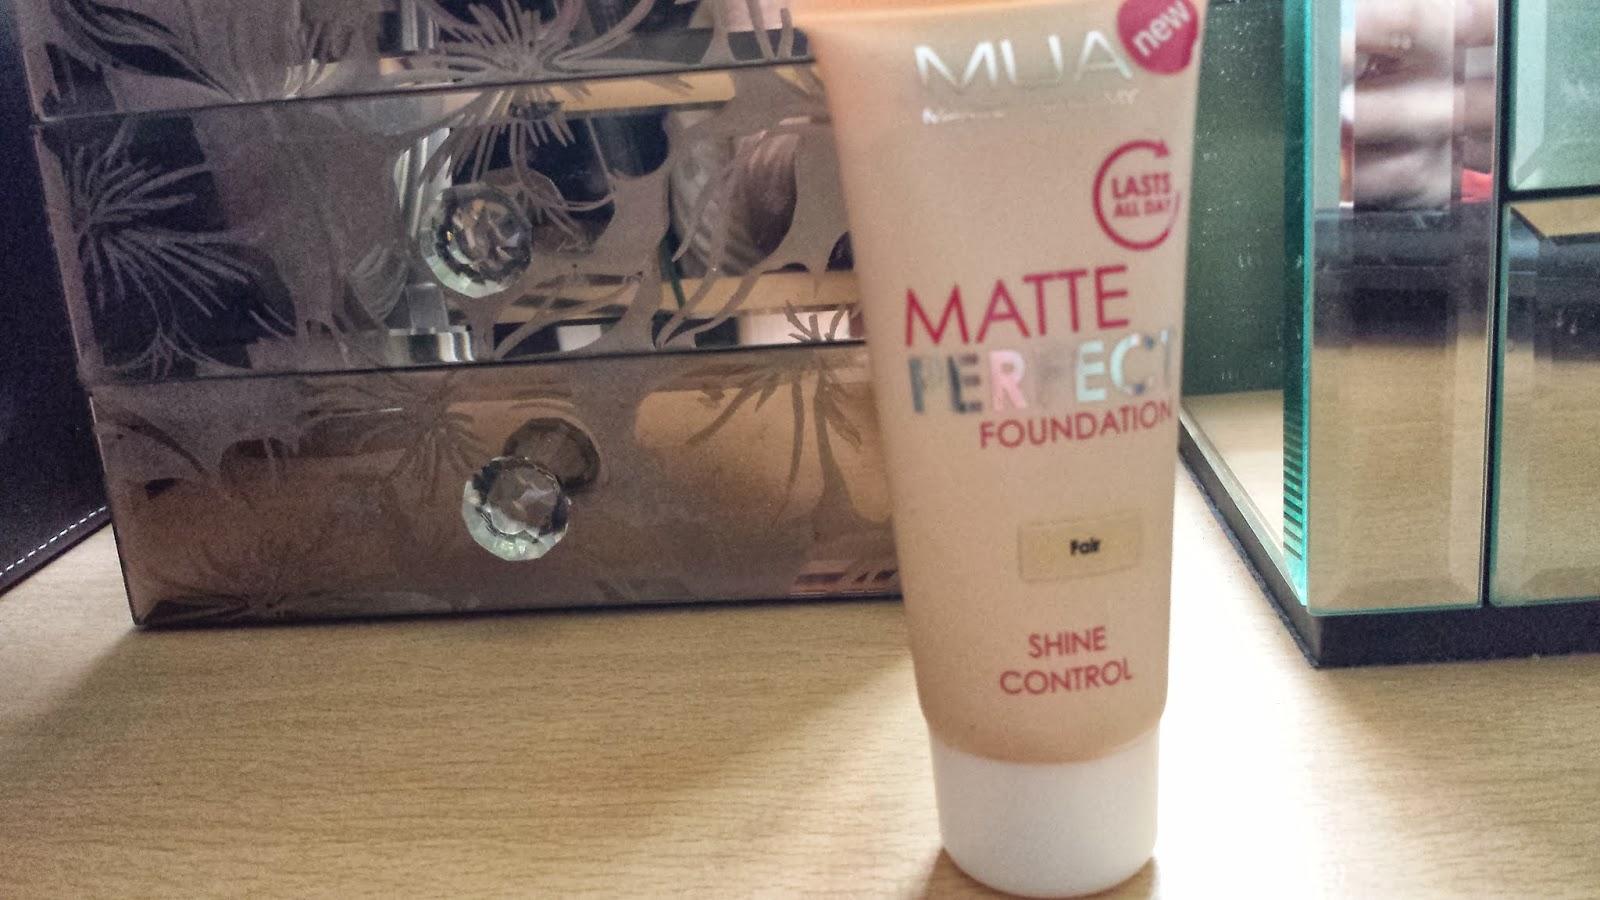 mua matte perfect foundation review